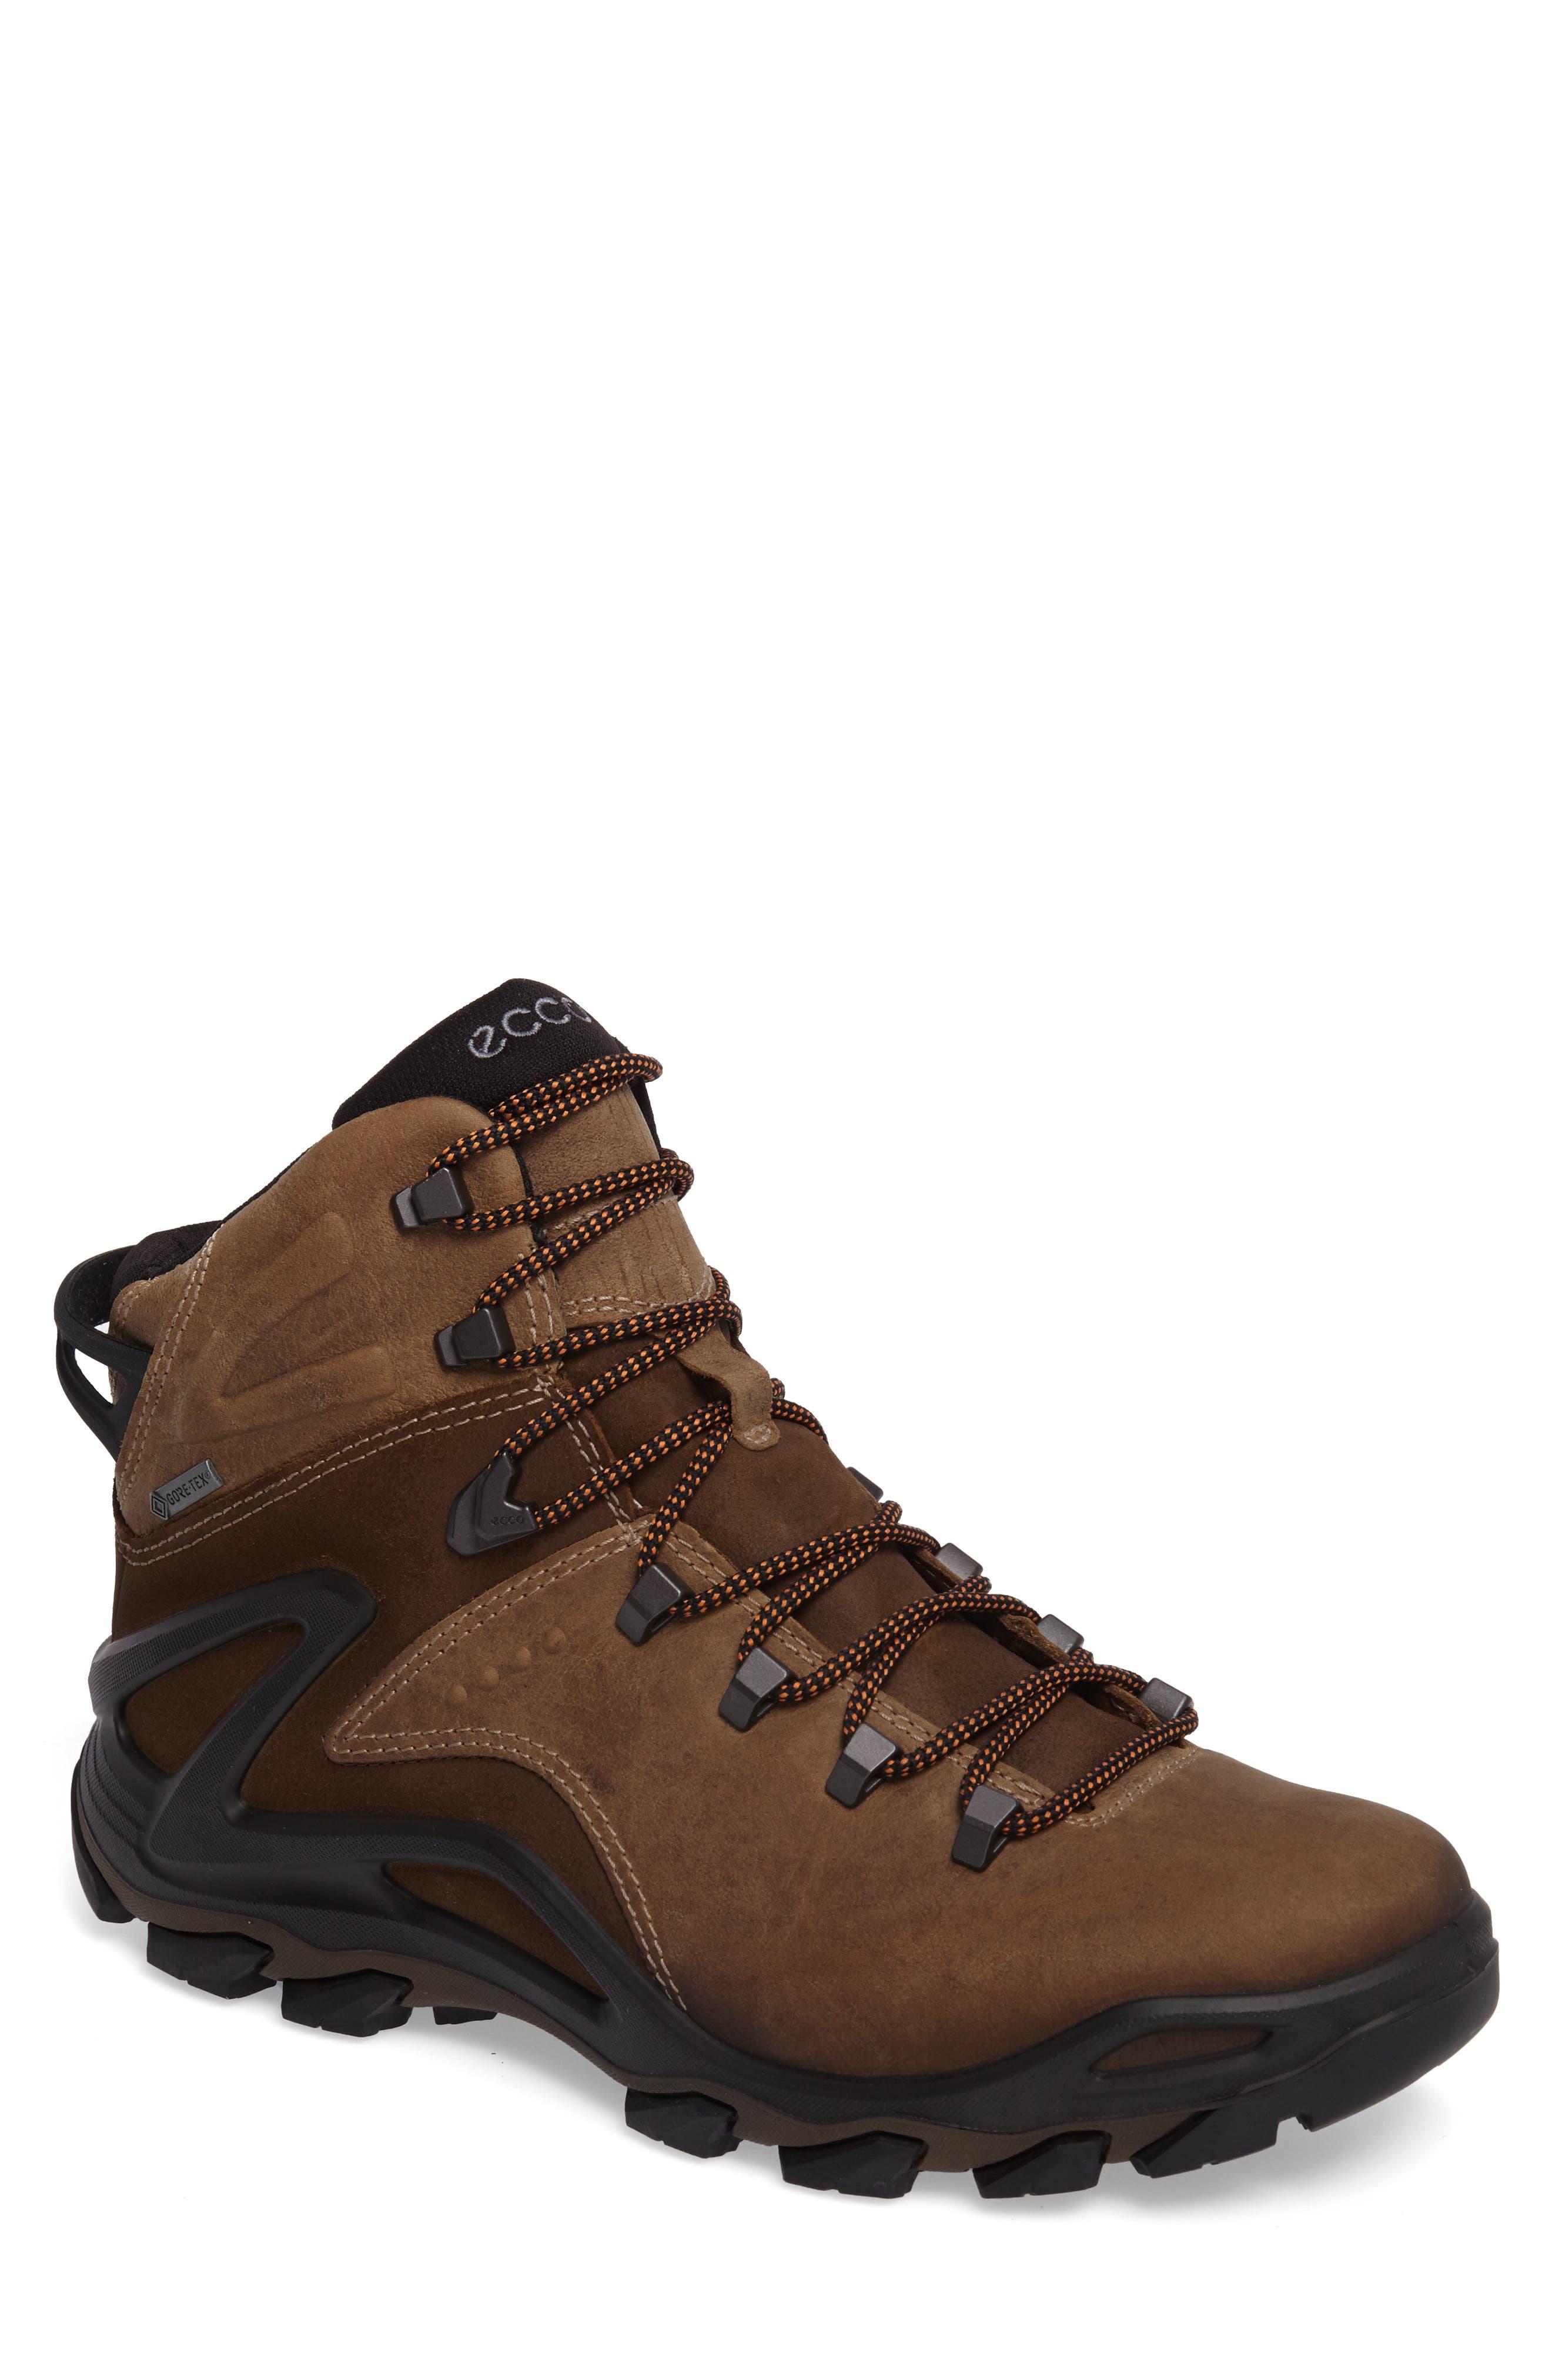 Terra Evo GTX Mid Hiking Boot,                             Main thumbnail 1, color,                             MOON ROCK NUBUCK/ SUEDE